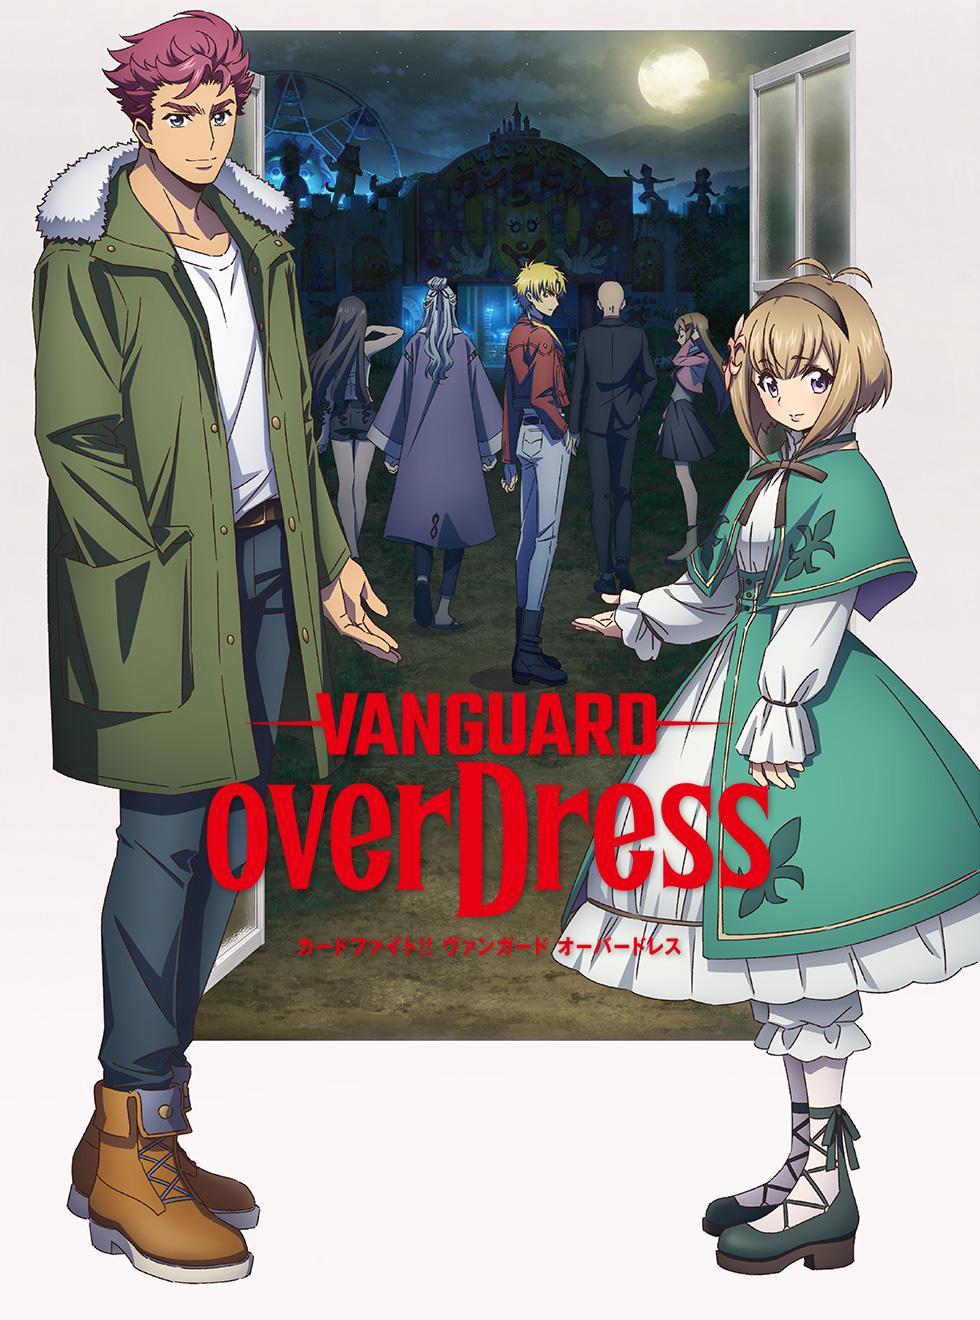 Cardfight!! Vanguard overDress ตอนที่ 1-12 ซับไทย [จบแล้ว]